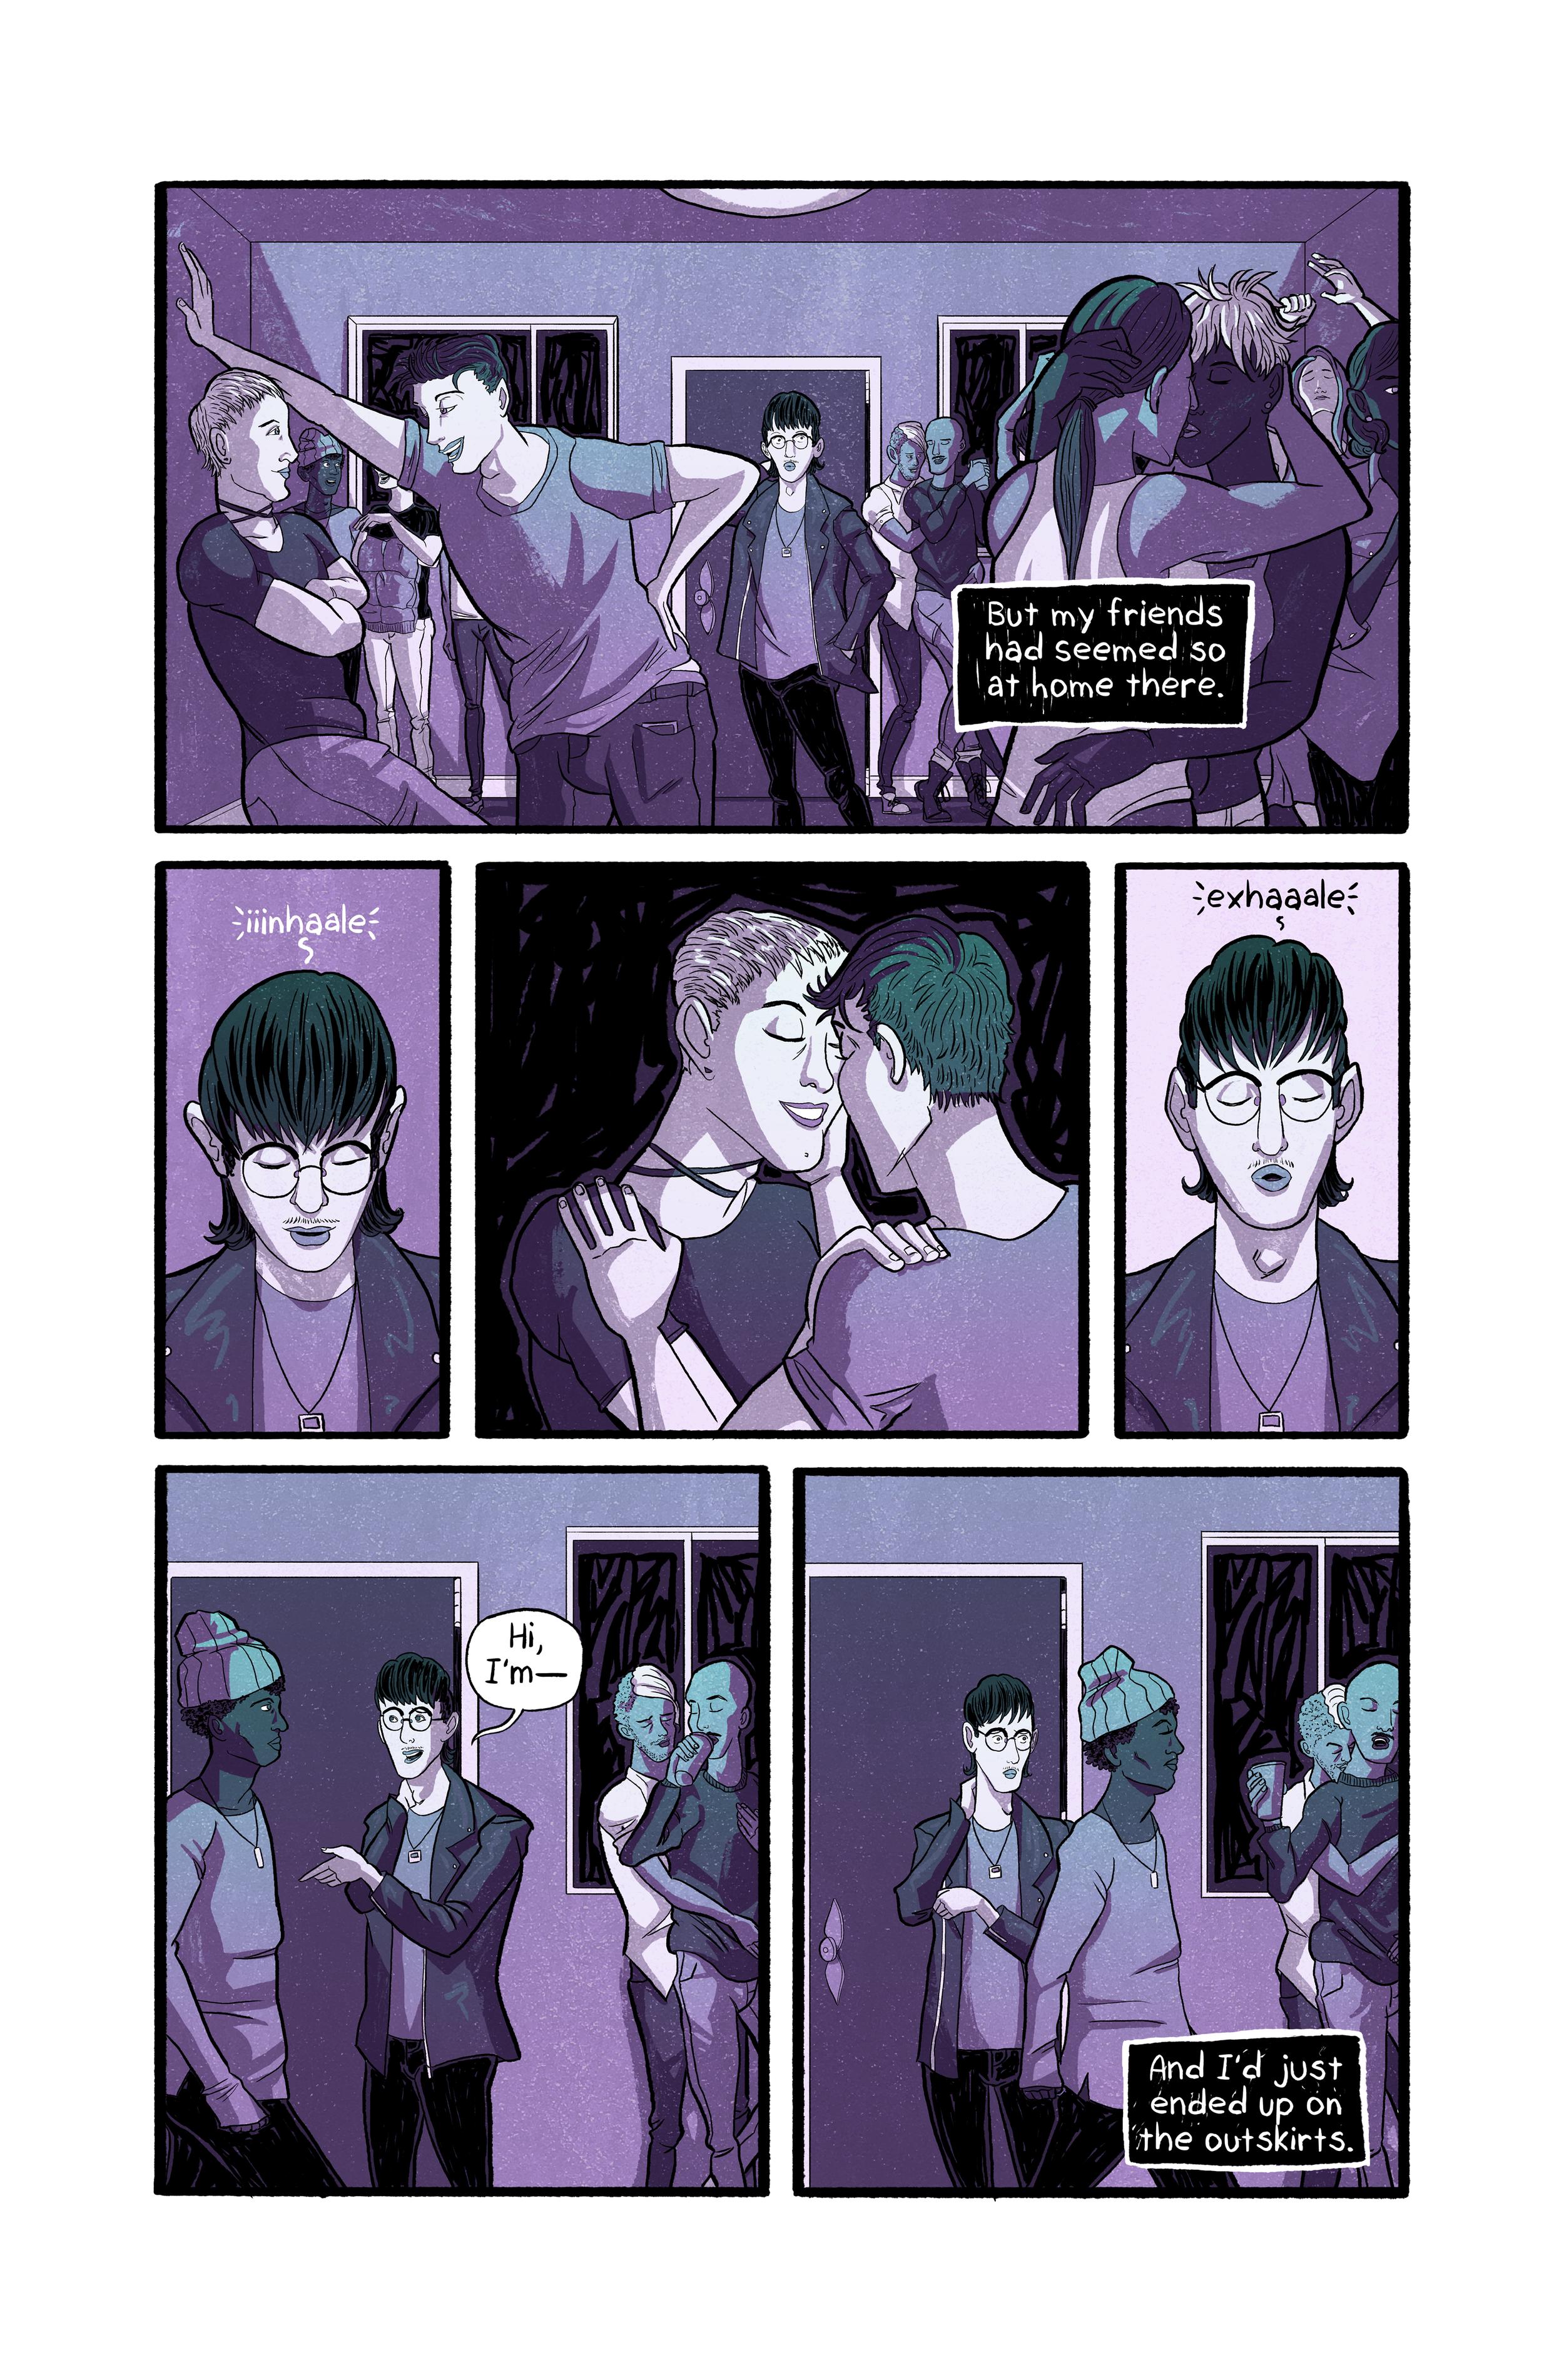 02untitled sad gay boy comic - page 04.png